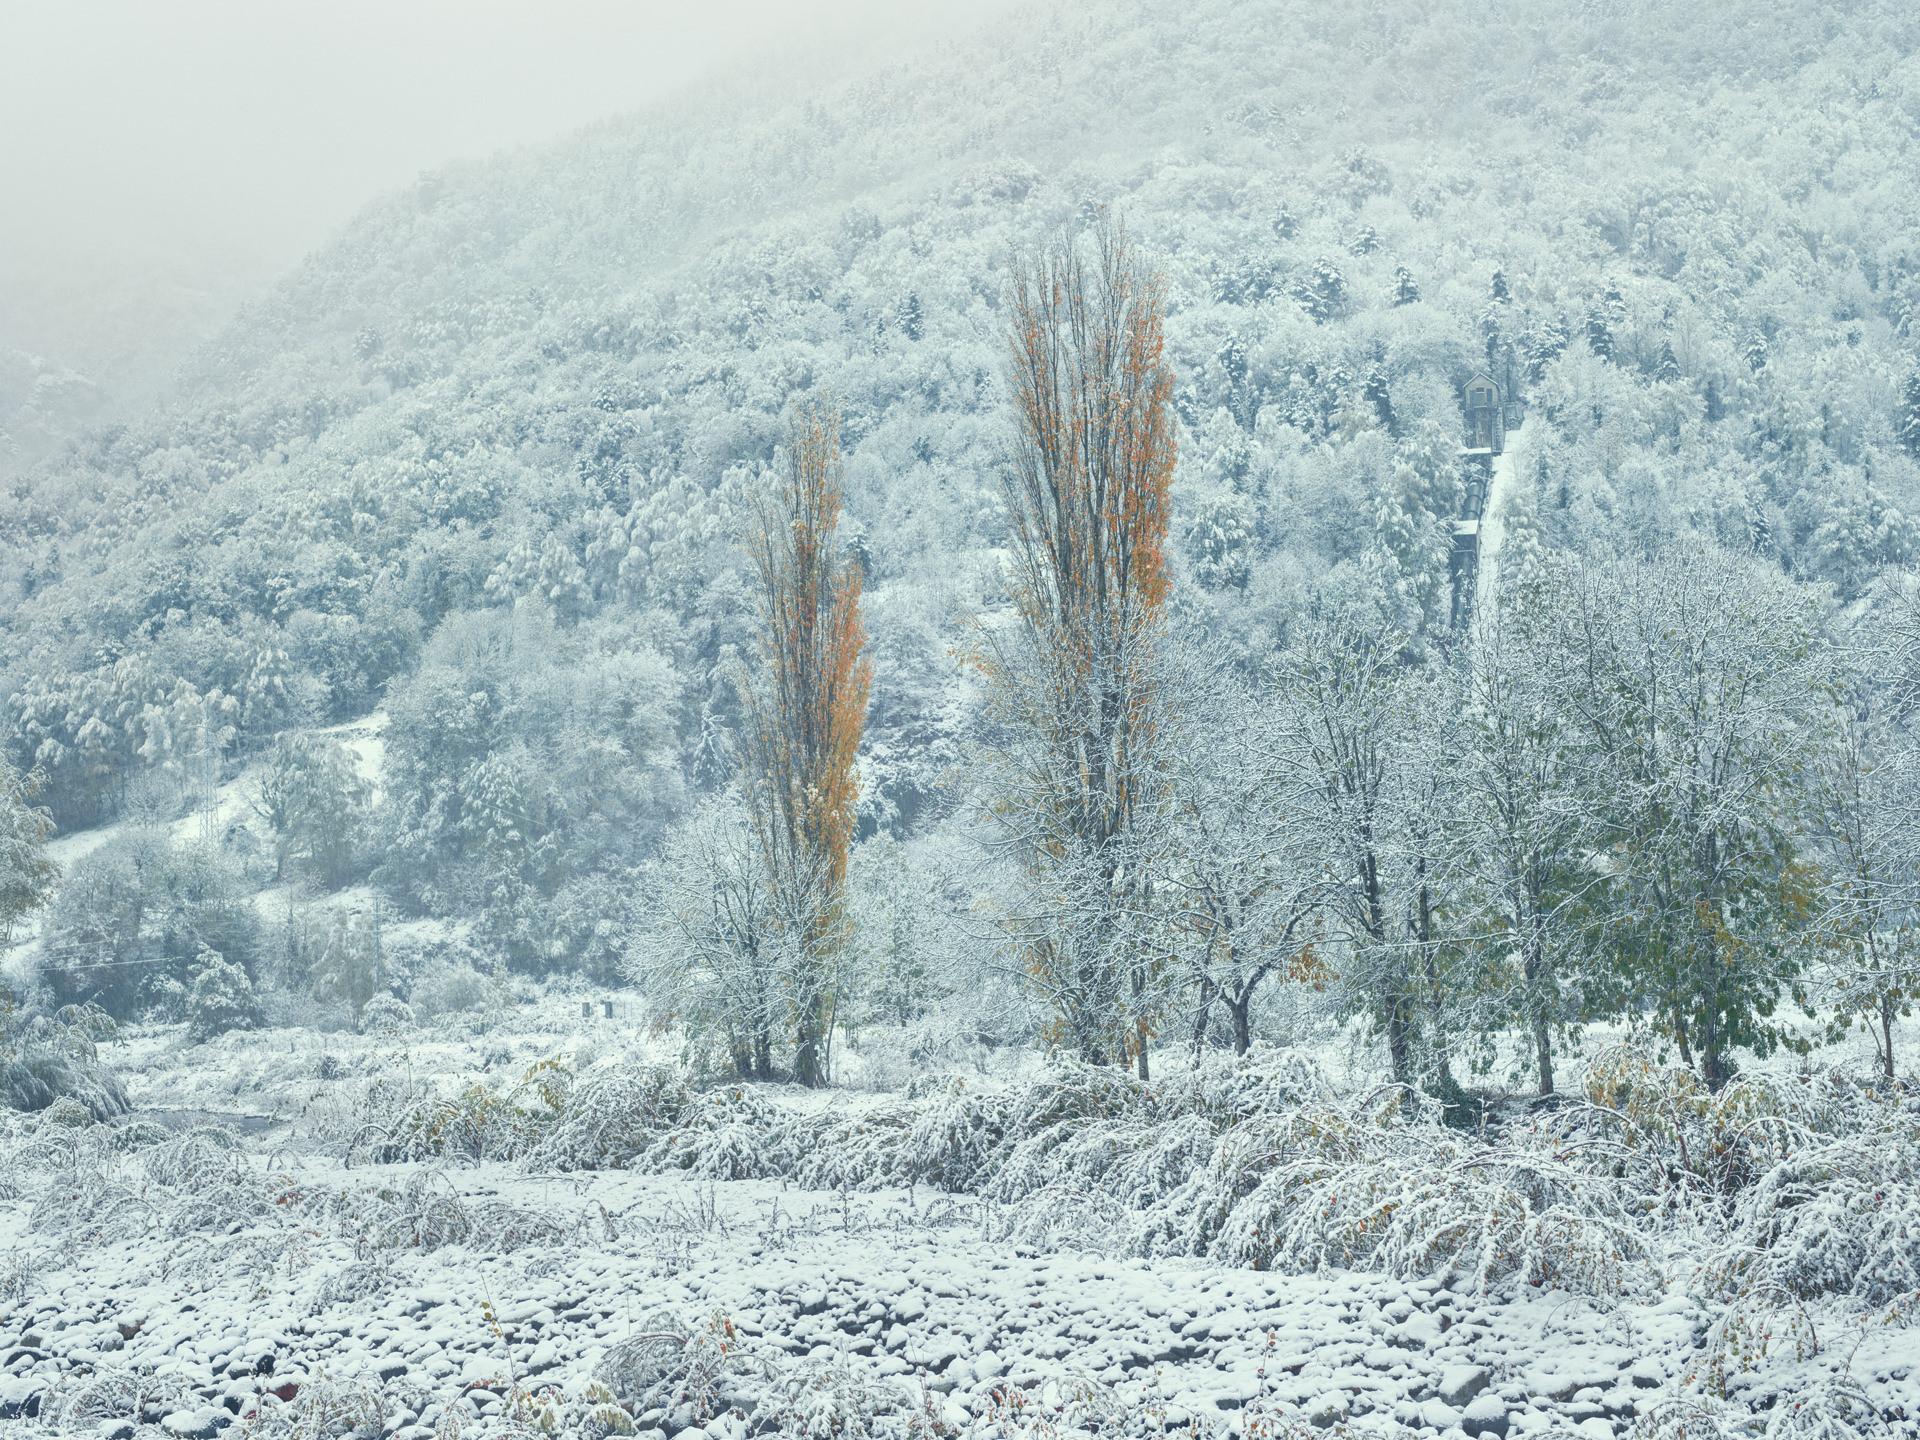 pyrenees, landscape, france, spain, anke luckmann, mountains, www.ankeluckmann.com, trees, white, snow